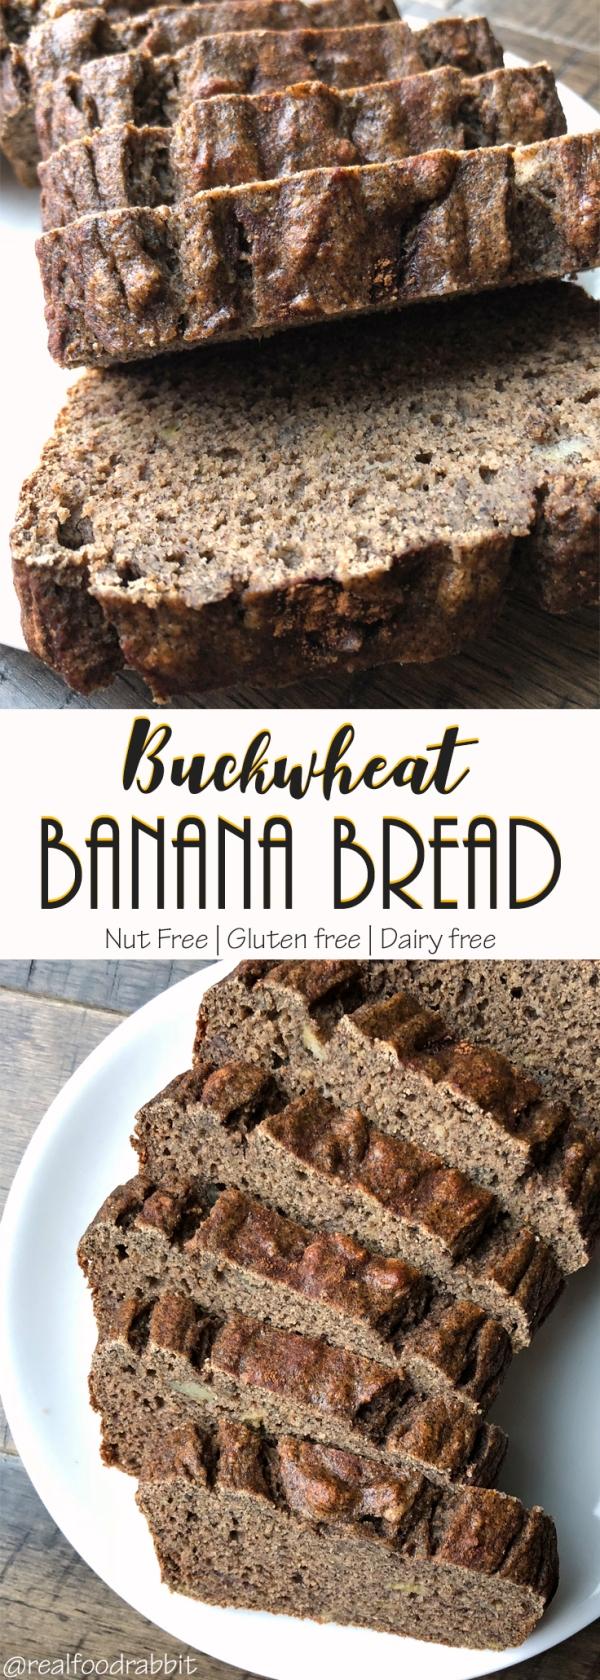 Buckwheat Banana Bread.jpg